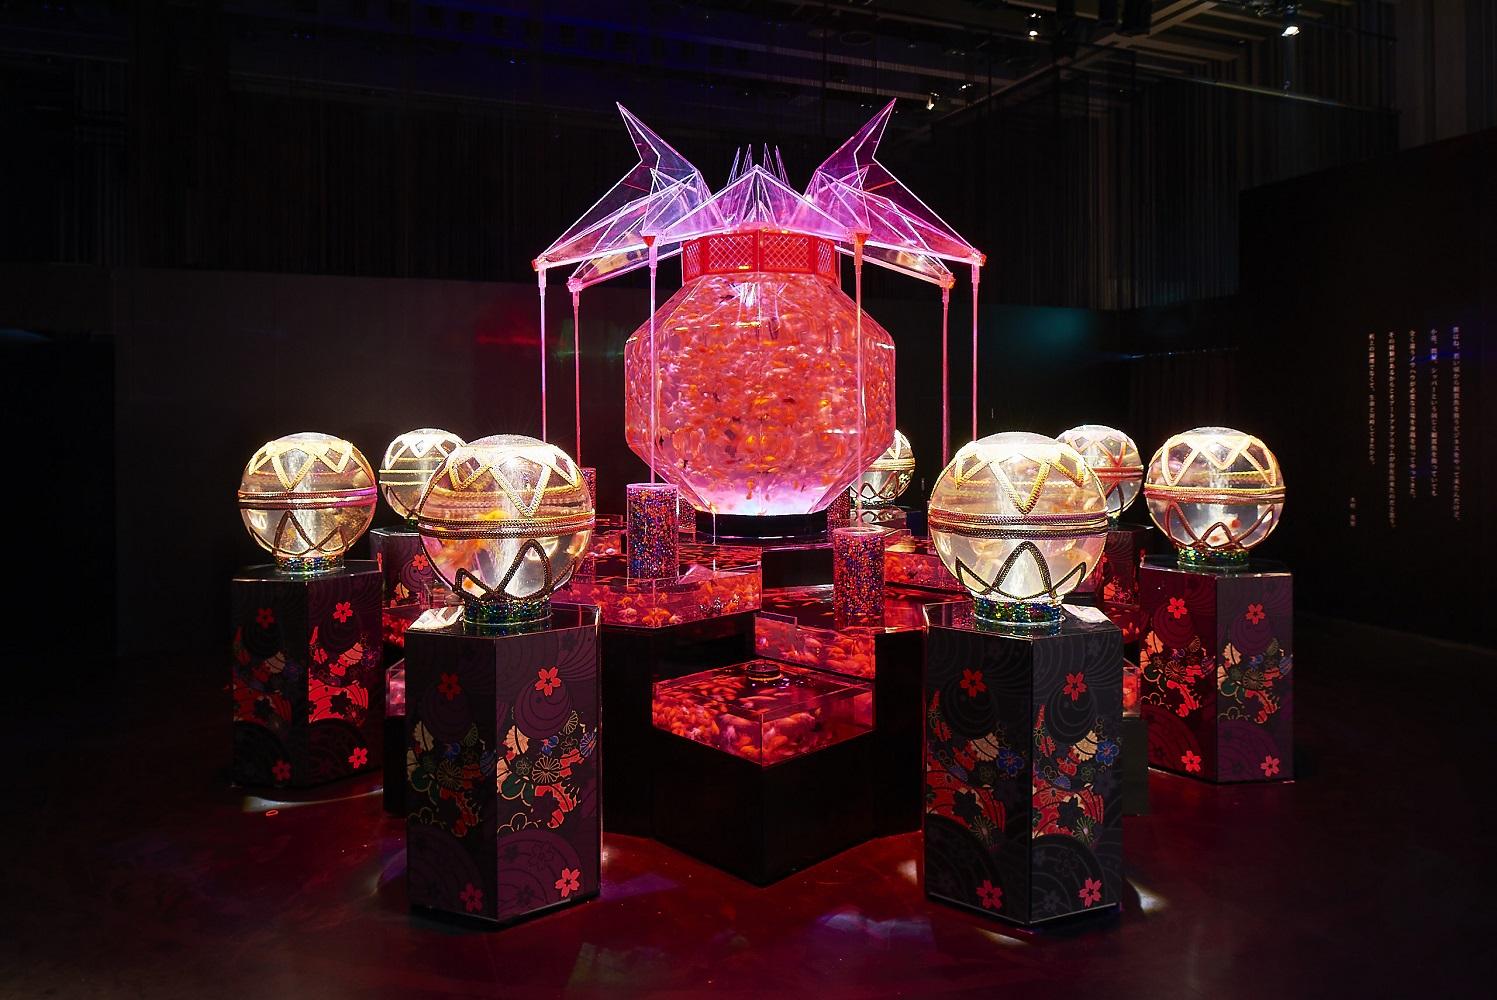 ECO EDO Nihonbashi - Art Aquarium 2017 (article d'amuzen)